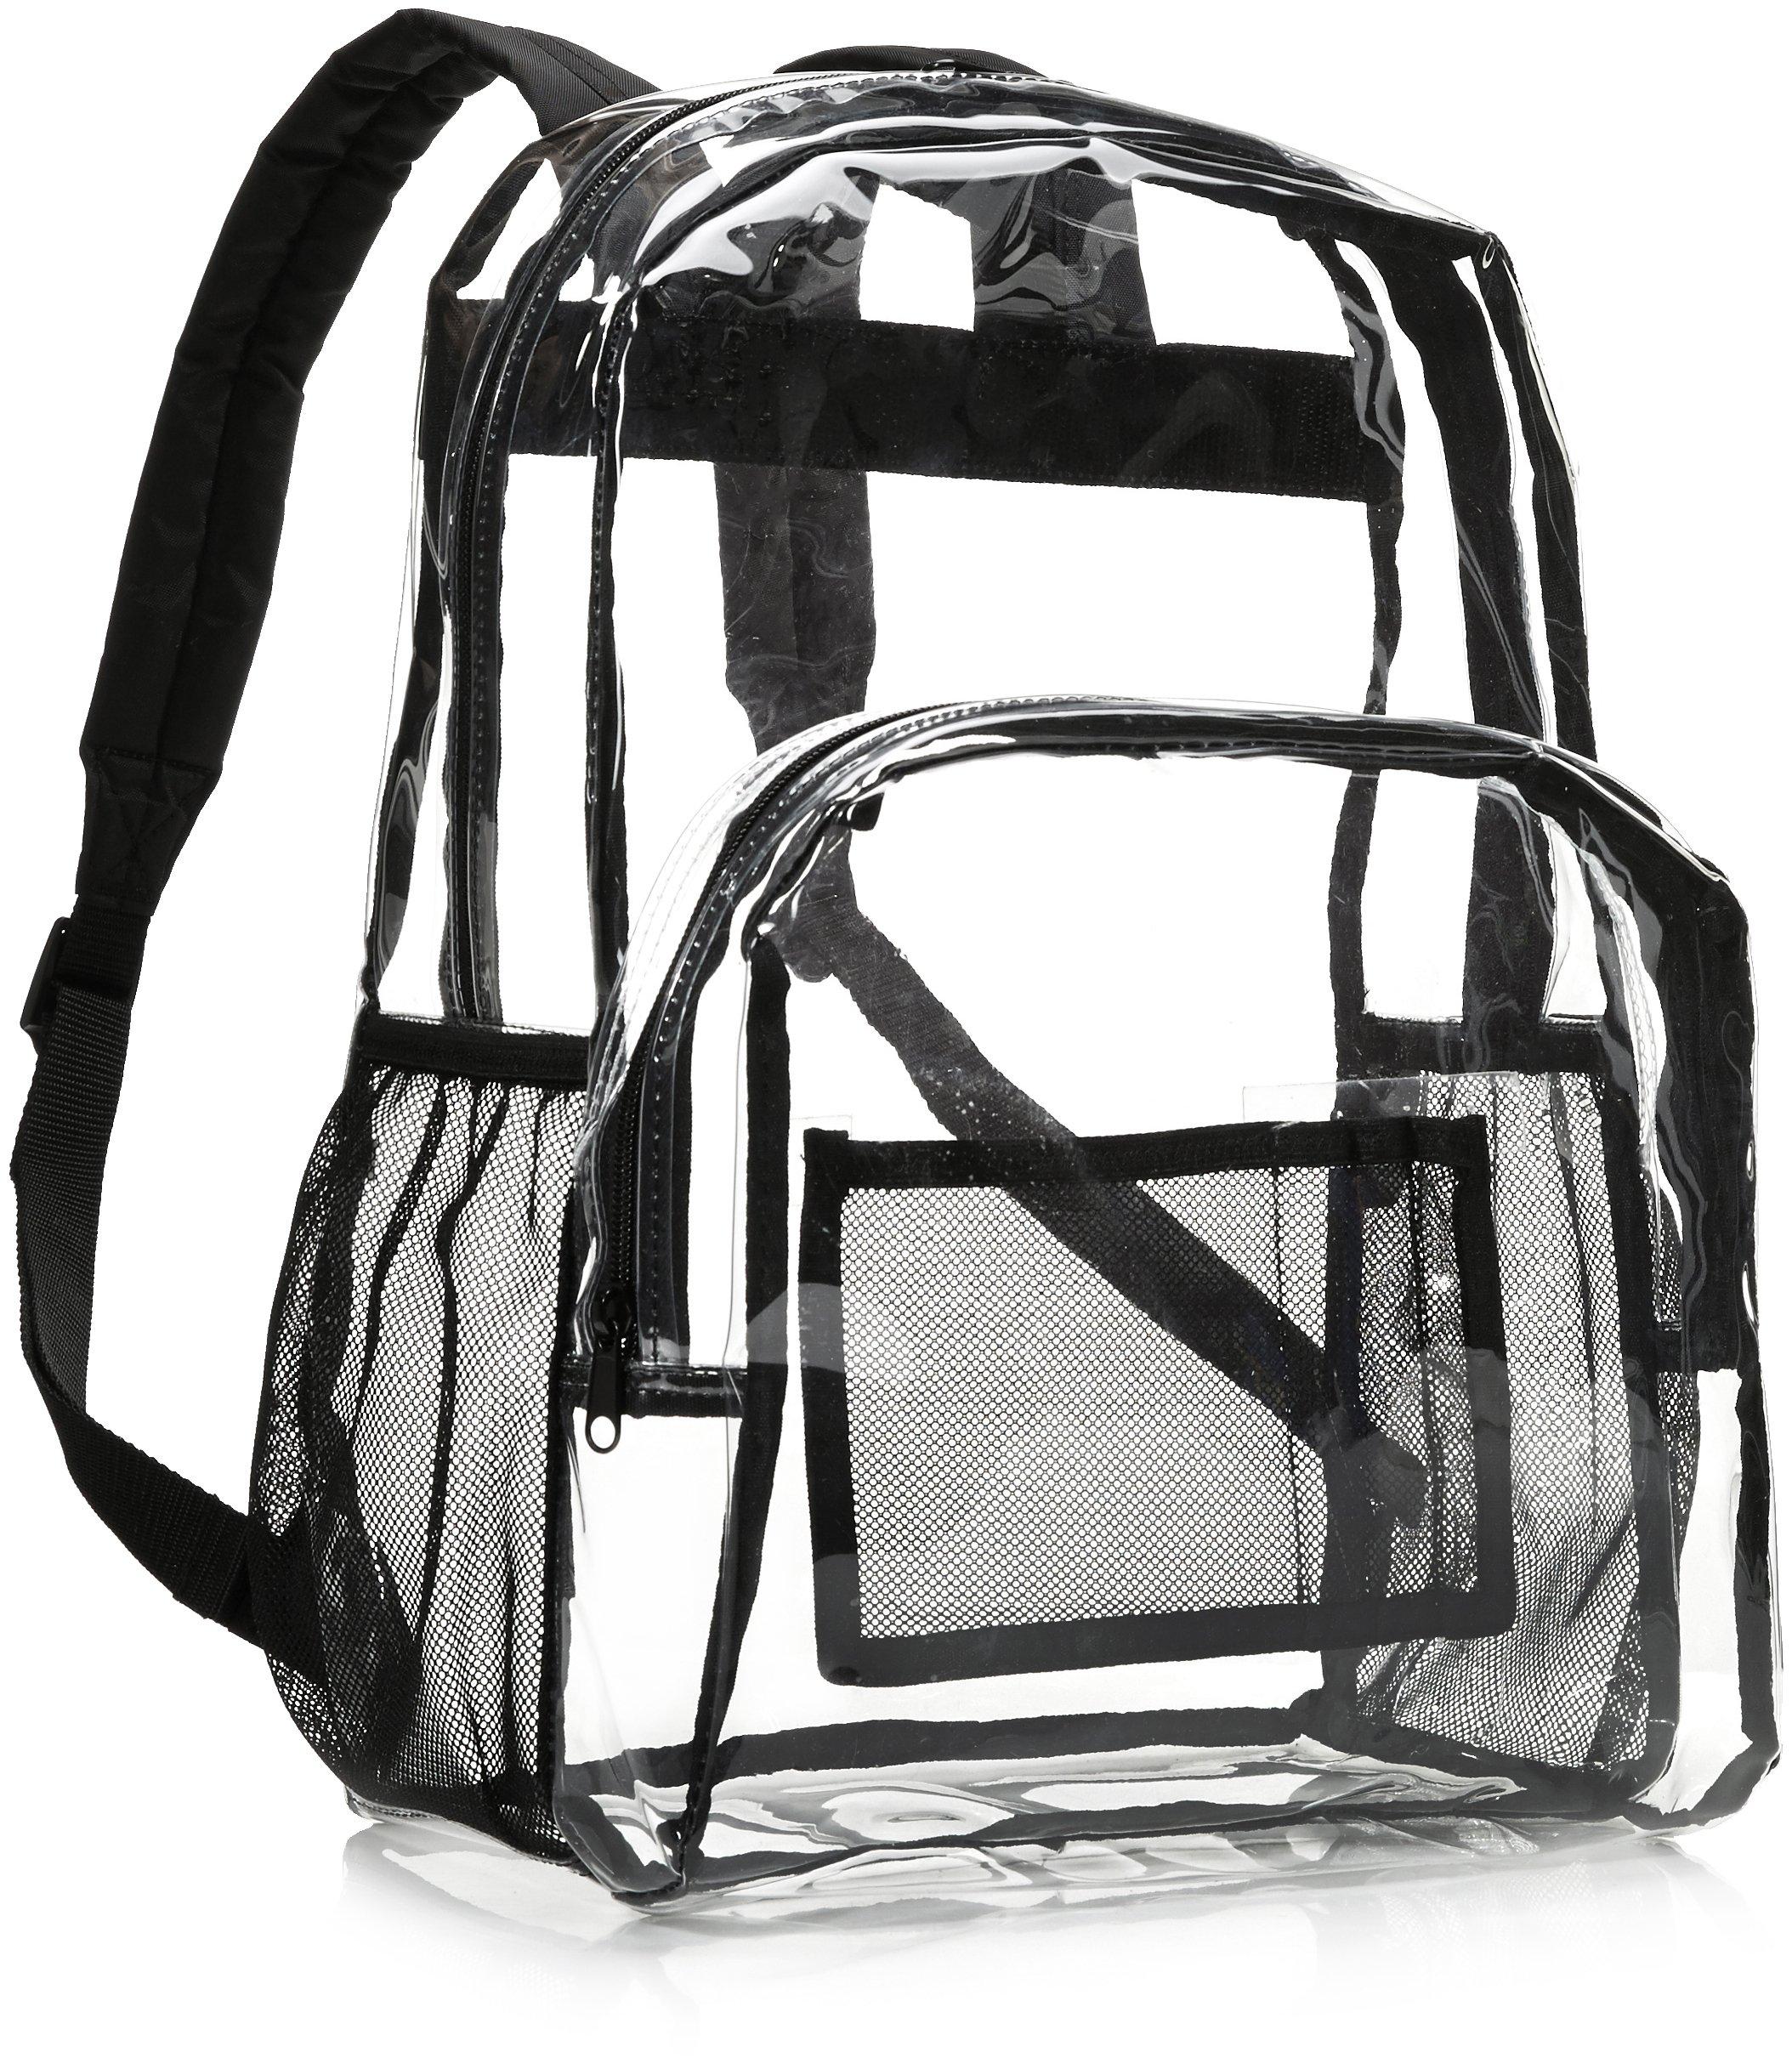 AmazonBasics School Backpack - Clear by AmazonBasics